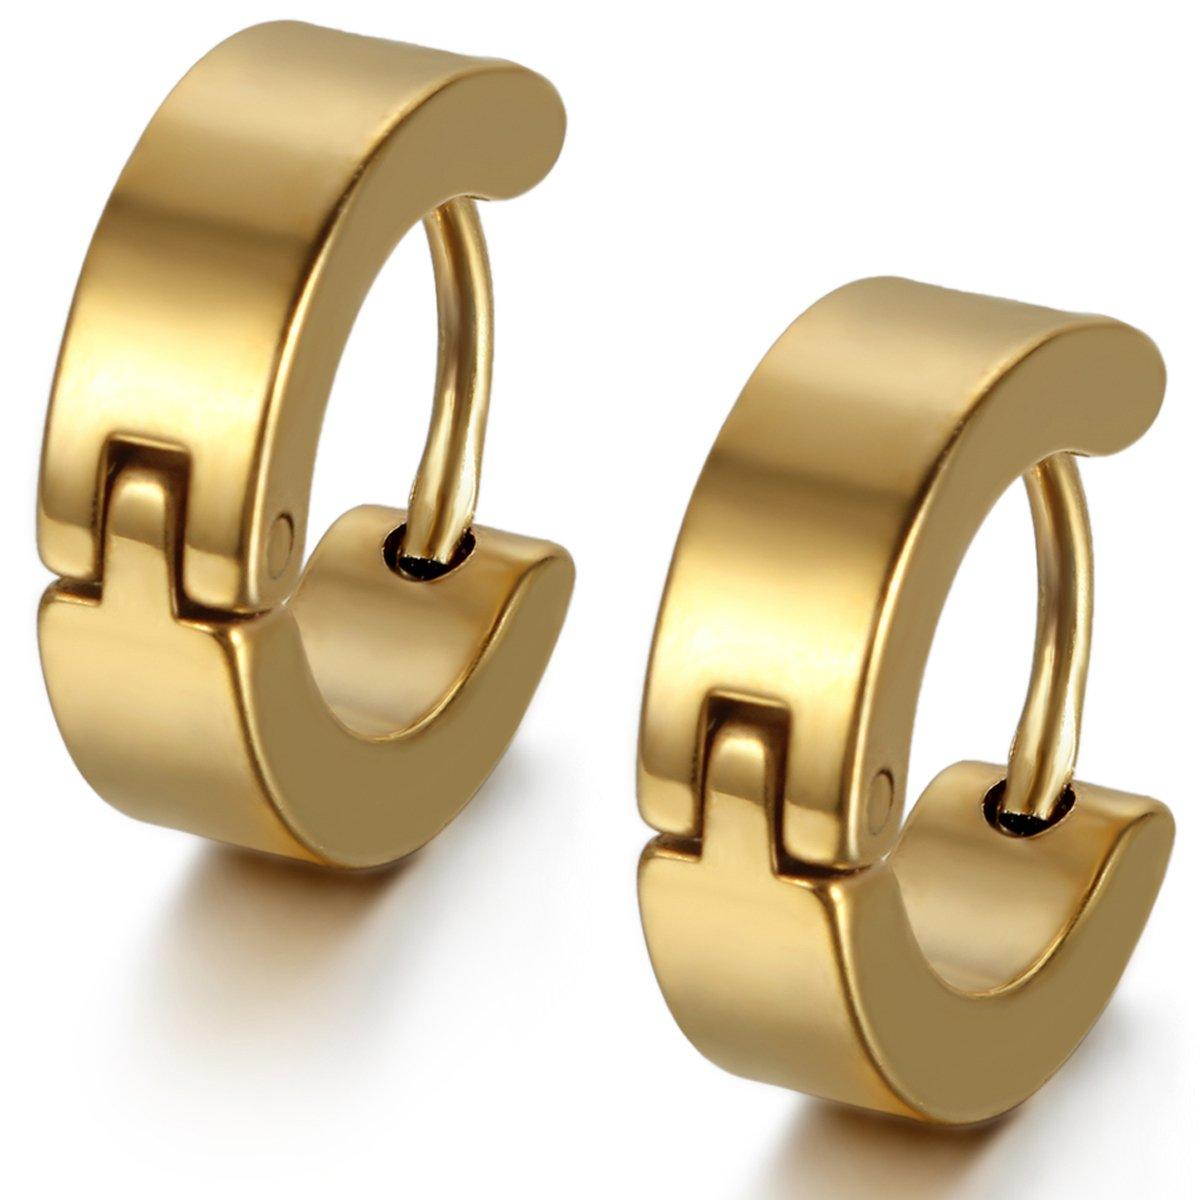 Flongo Men's Classic Stainless Steel Plain Charm Elegant Stud Hoop Huggie Earrings FLG04623